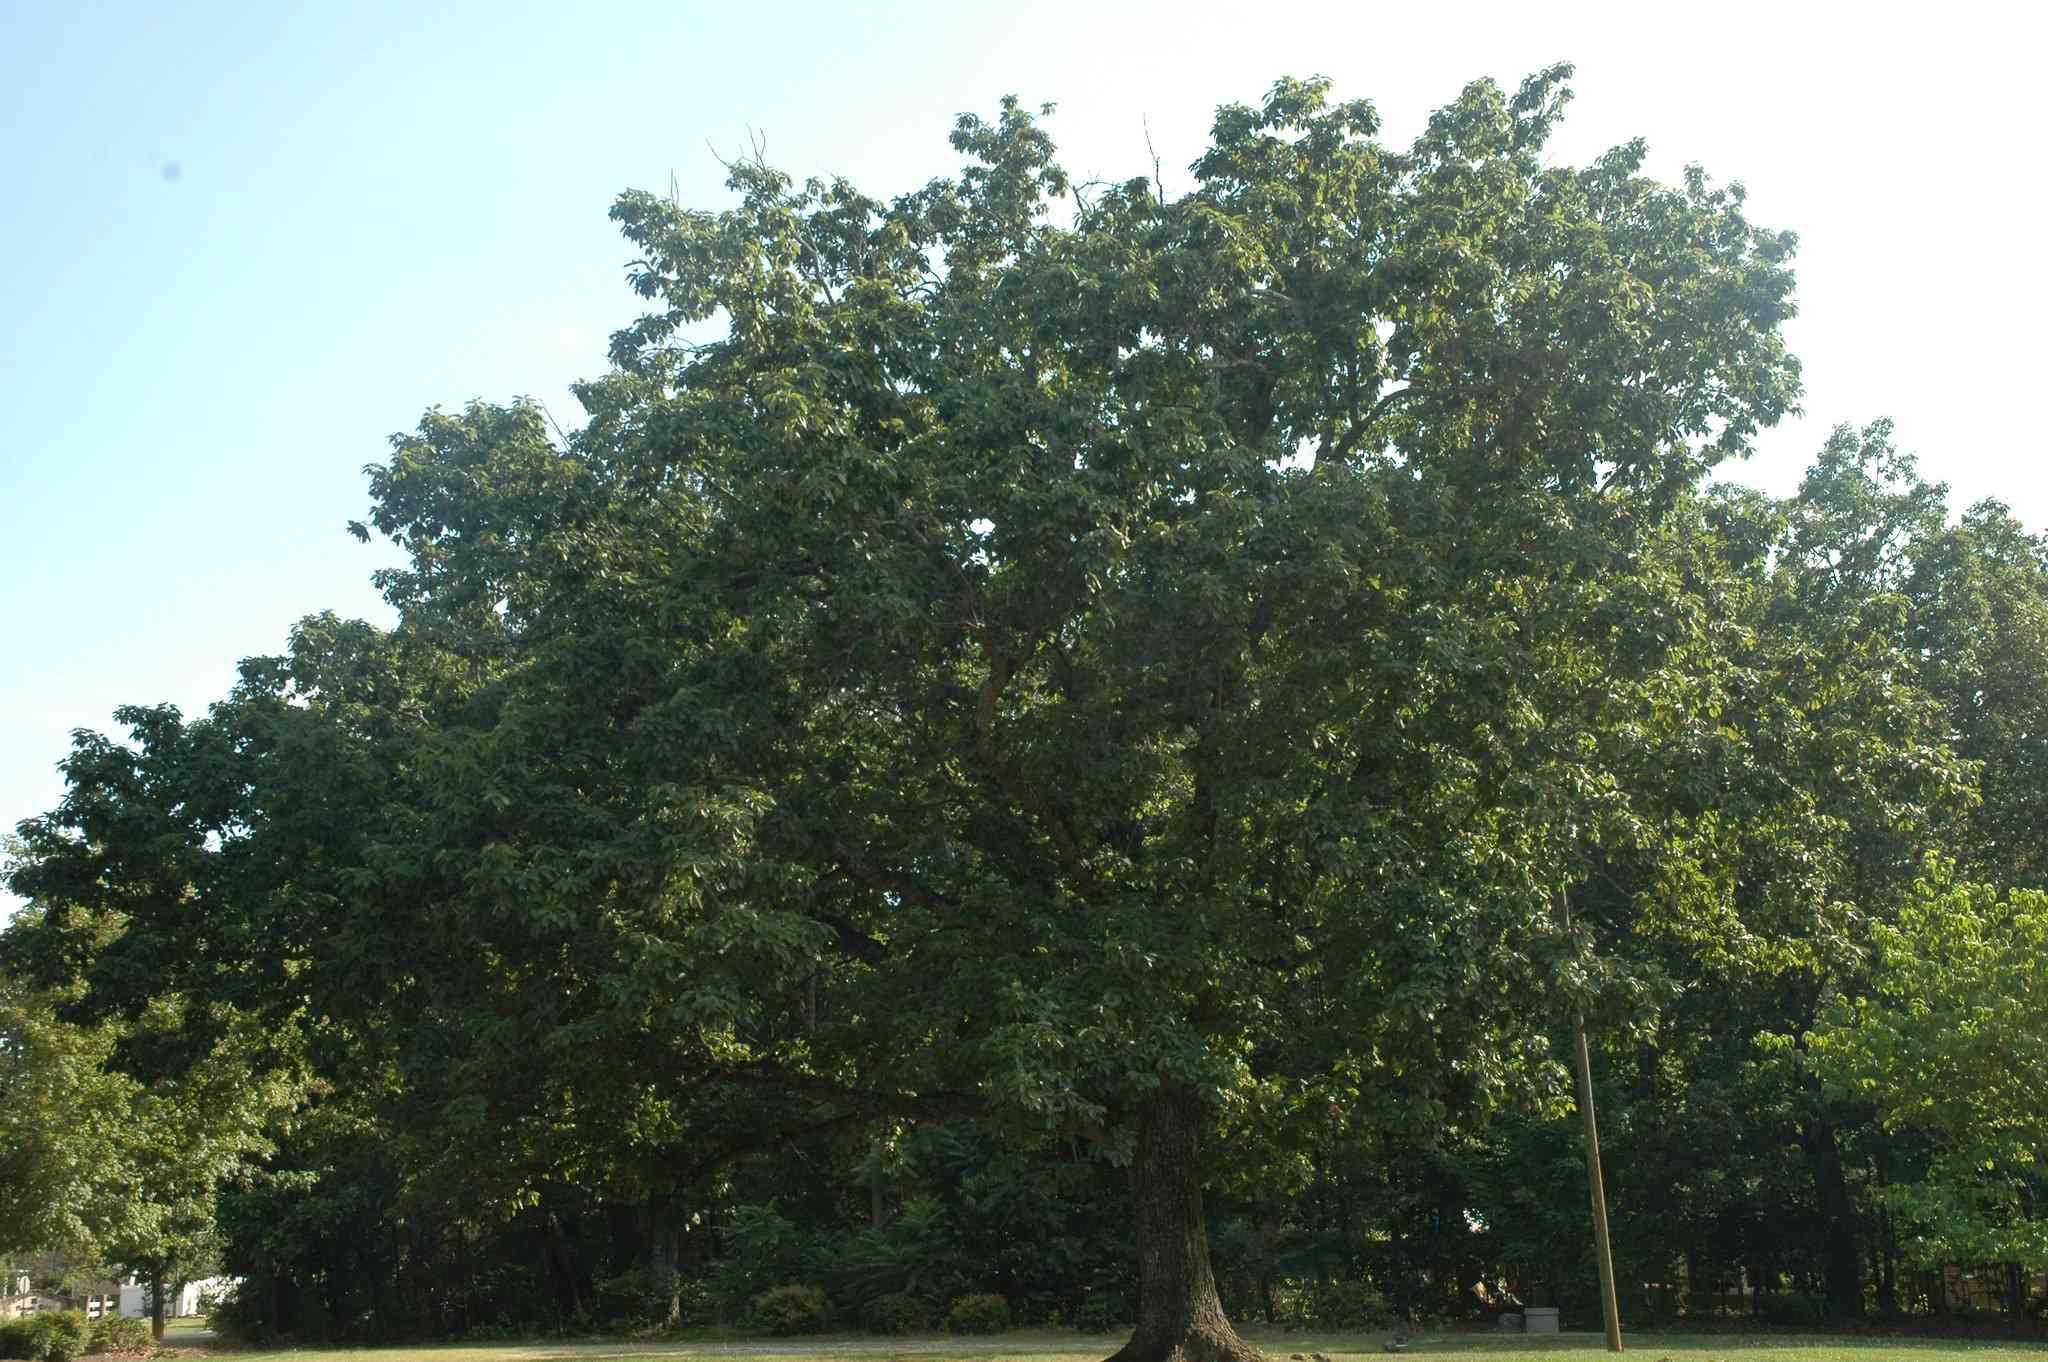 A large Chestnut Oak in a park.